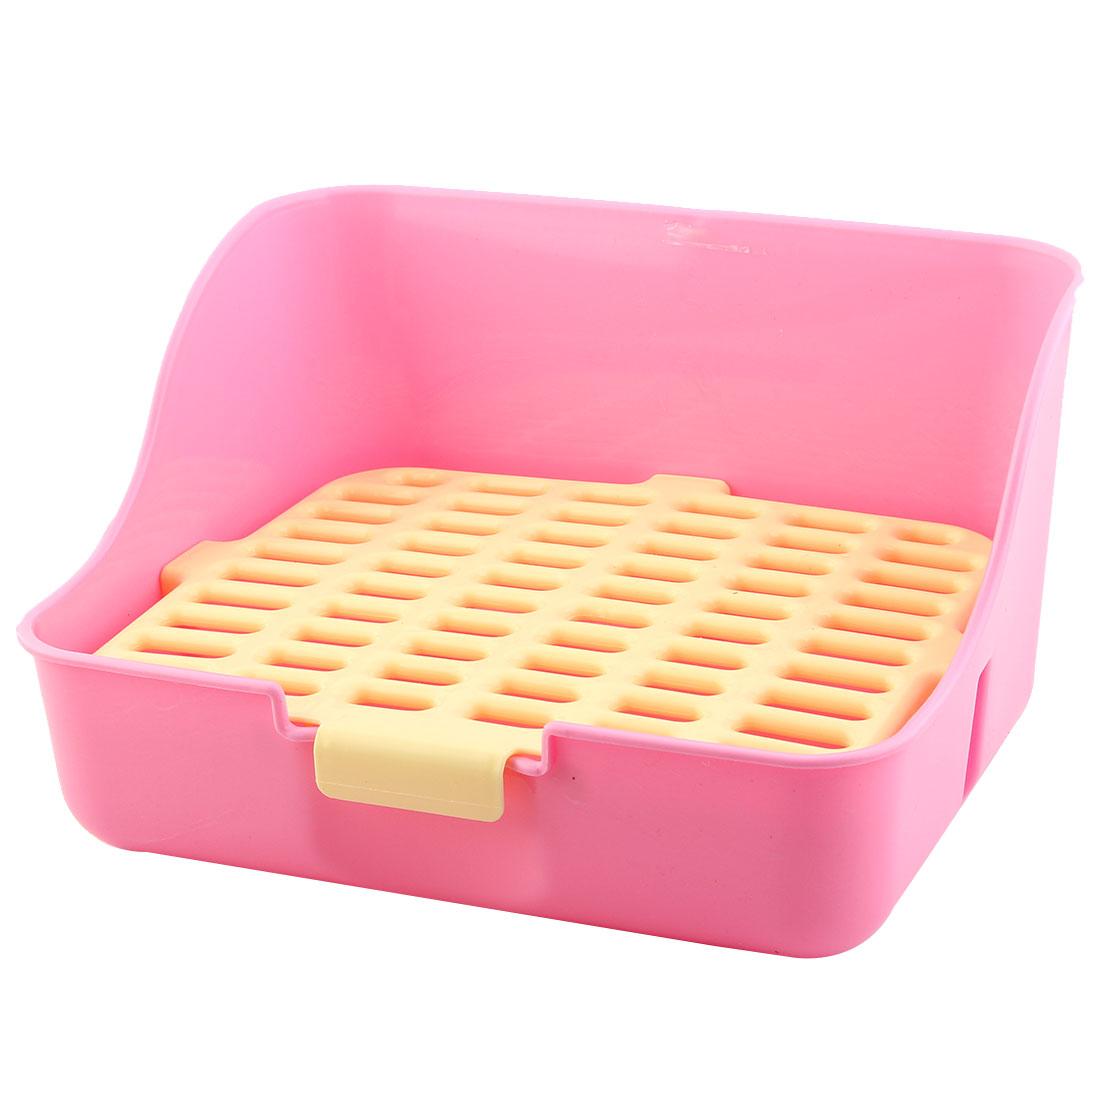 Indoor Plastic Rectangle Mesh Style Pet Rabbit Dog Cat Toilet Potty Yellow Pink